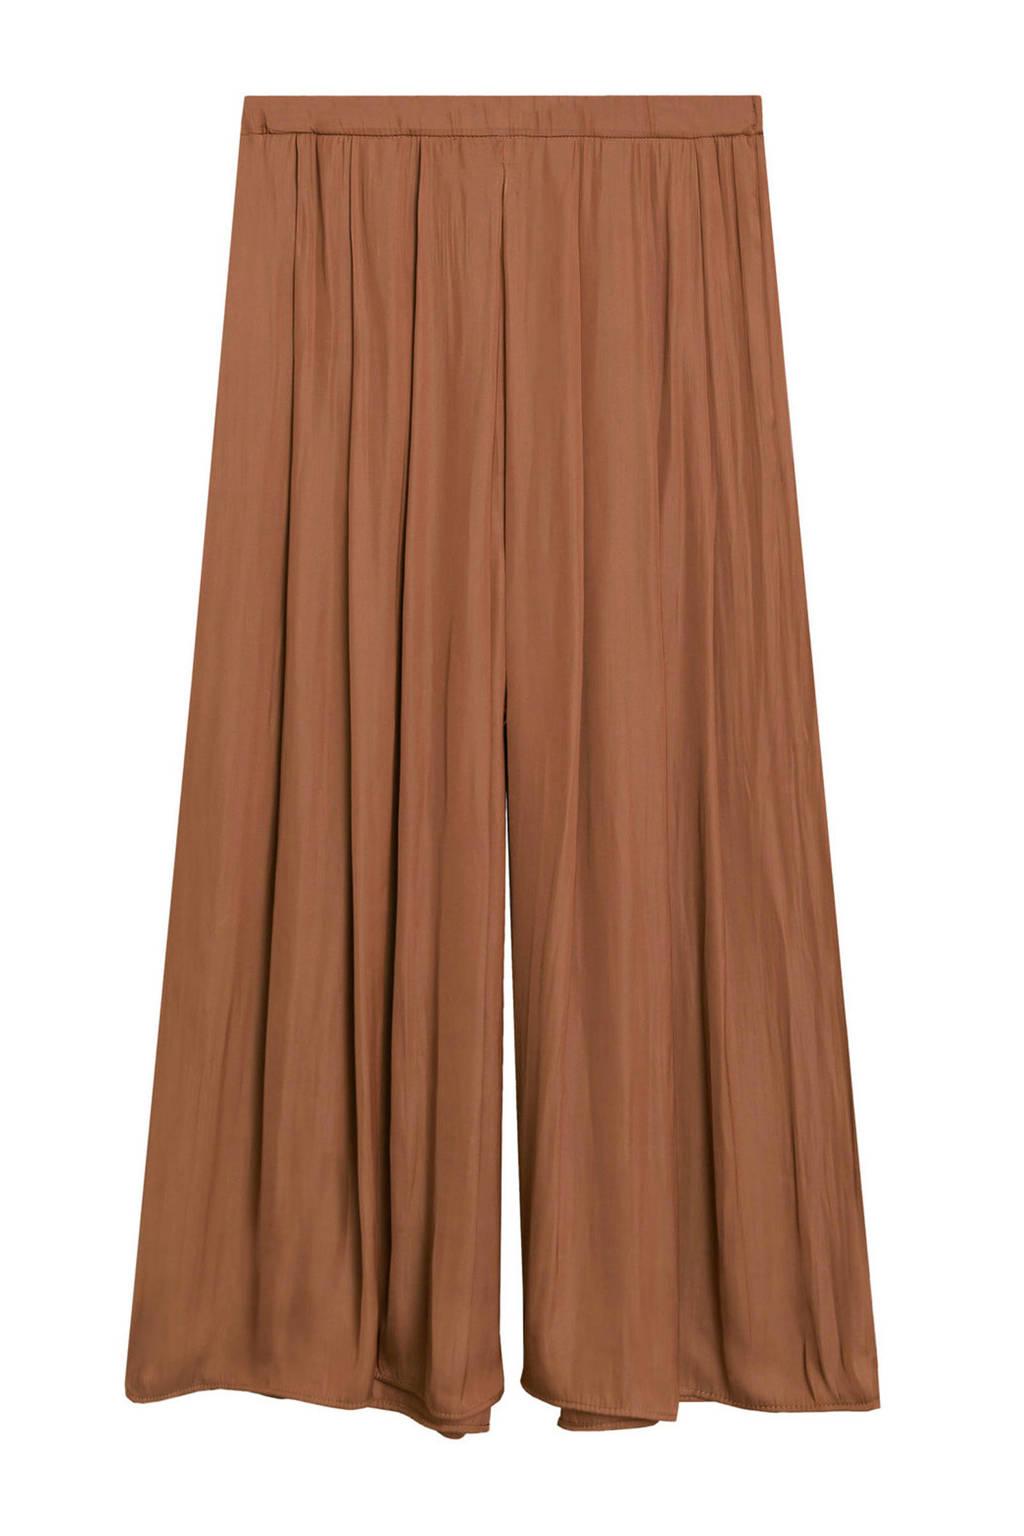 Mango cropped high waist loose fit pantalon bruin, Bruin